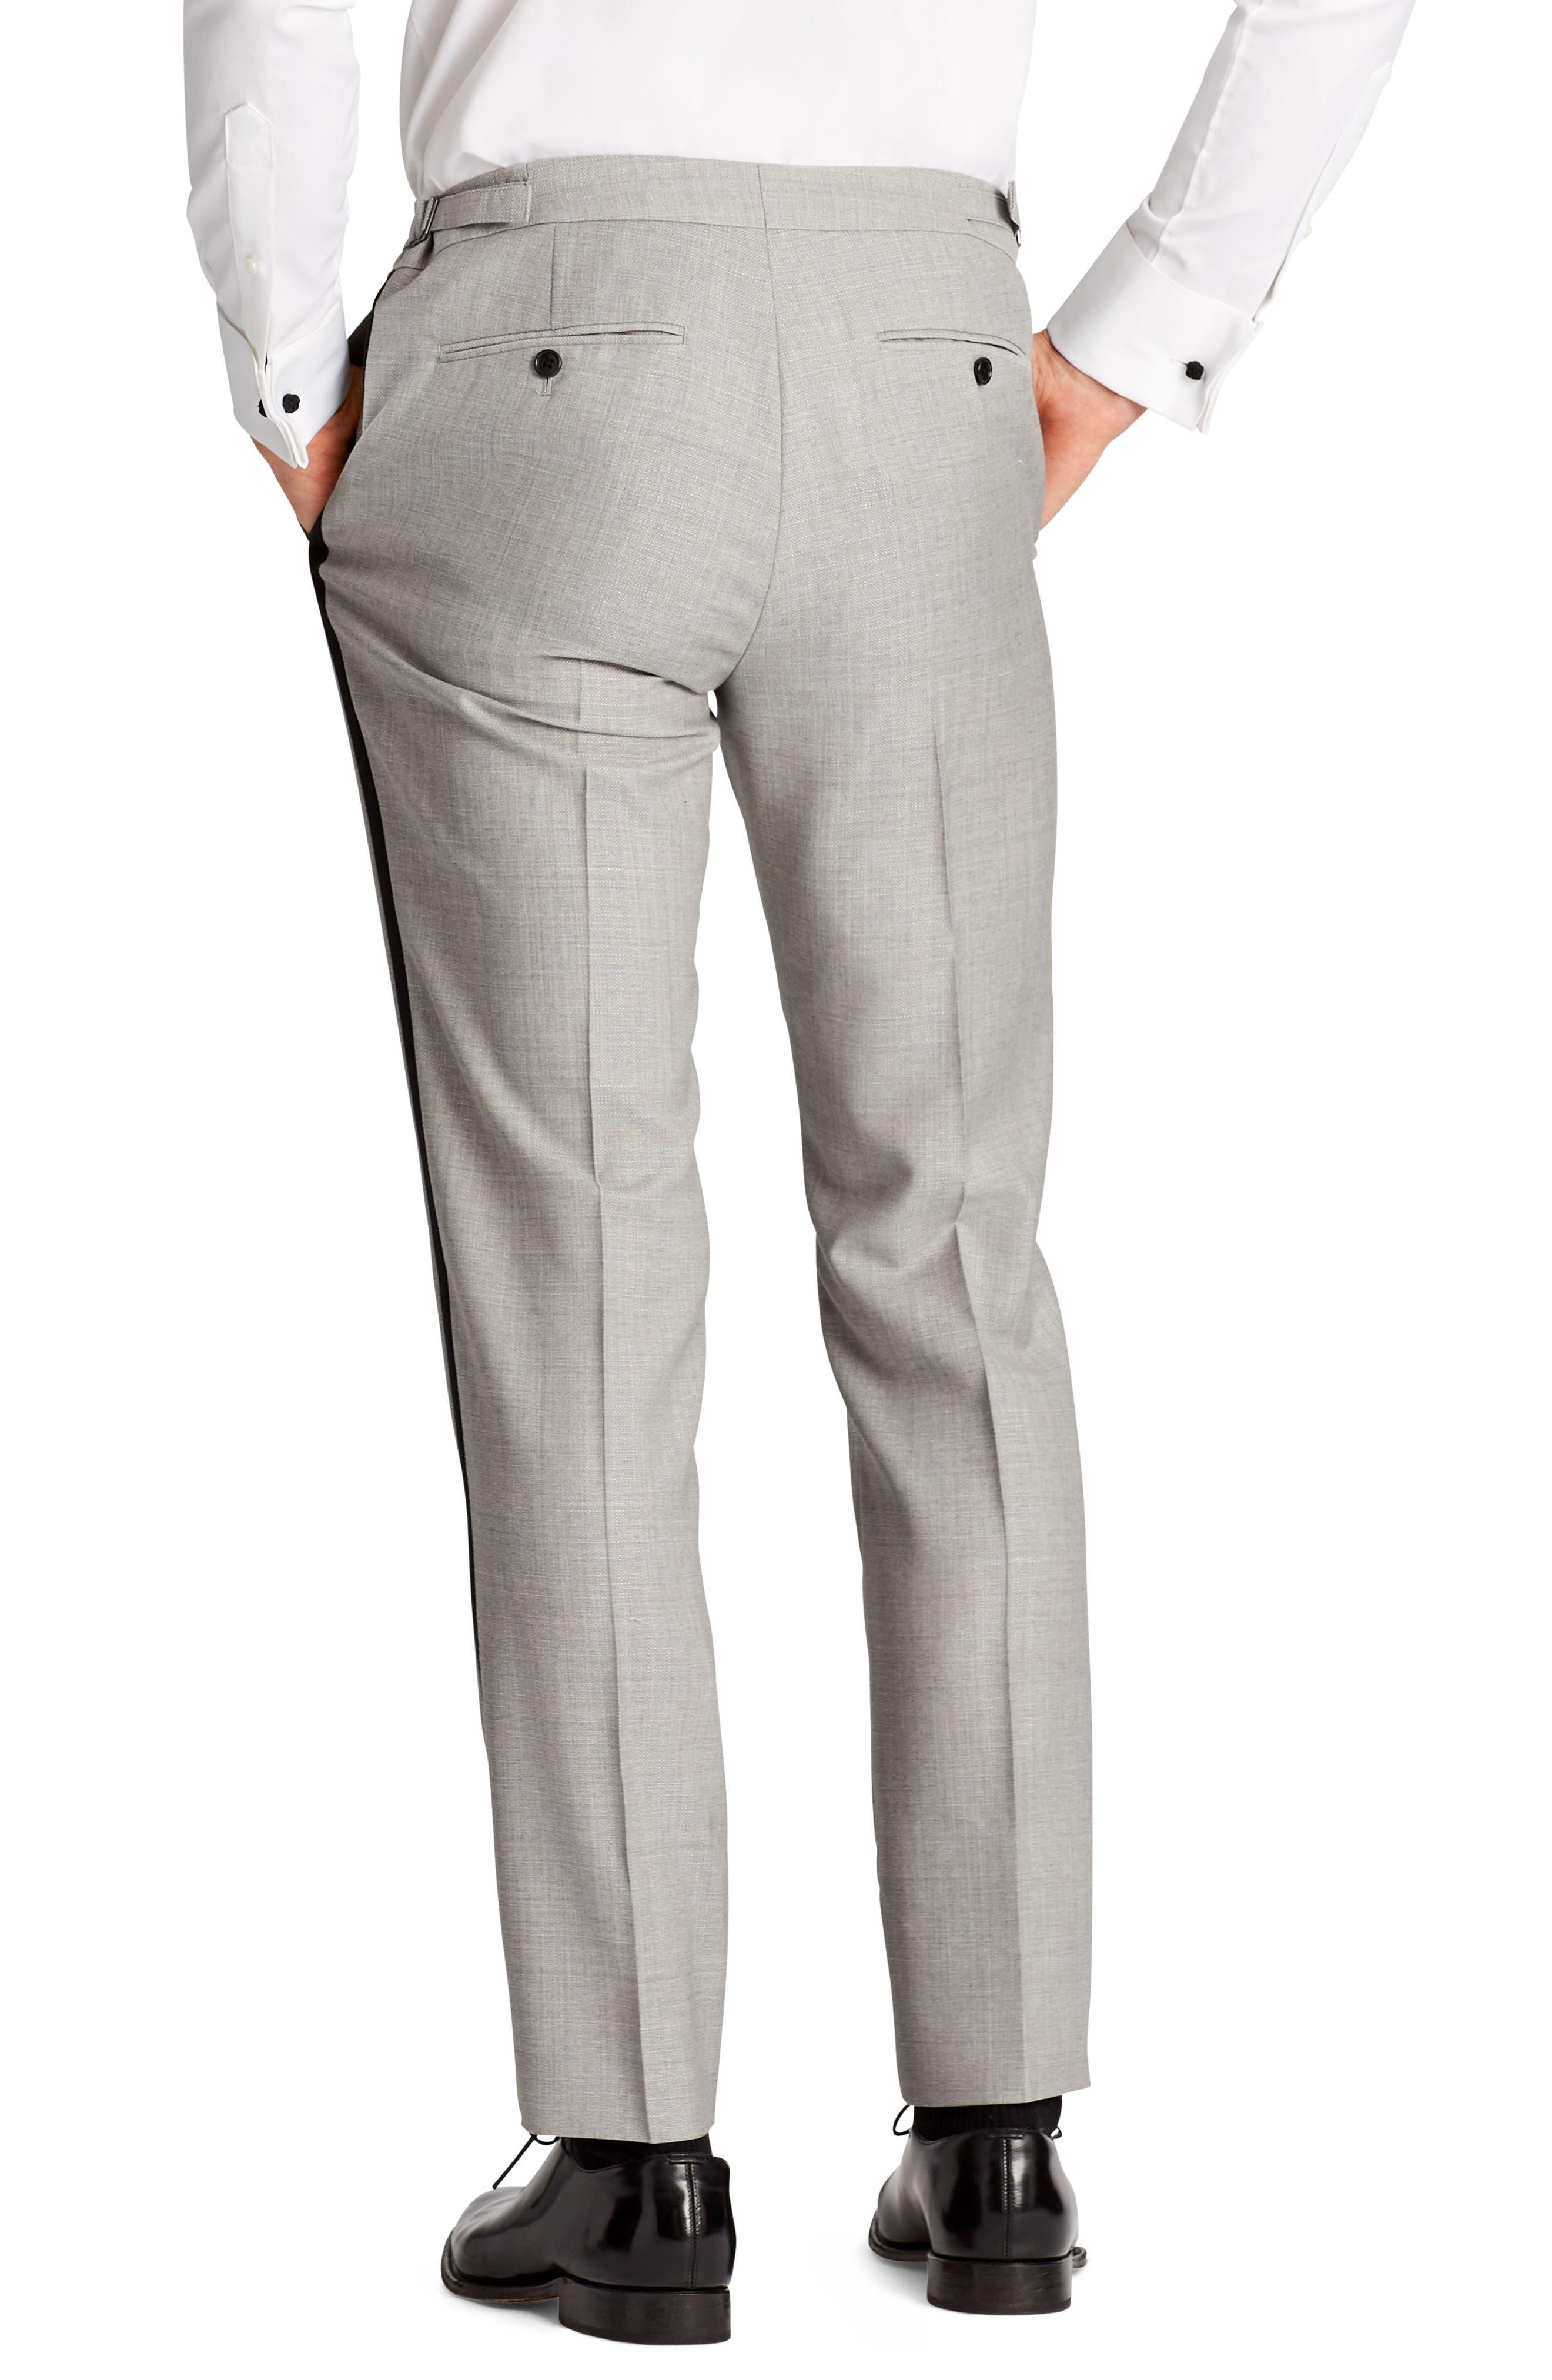 Capstone Flat Front Tuxedo Trousers,                             Alternate thumbnail 2, color,                             Pearl Grey